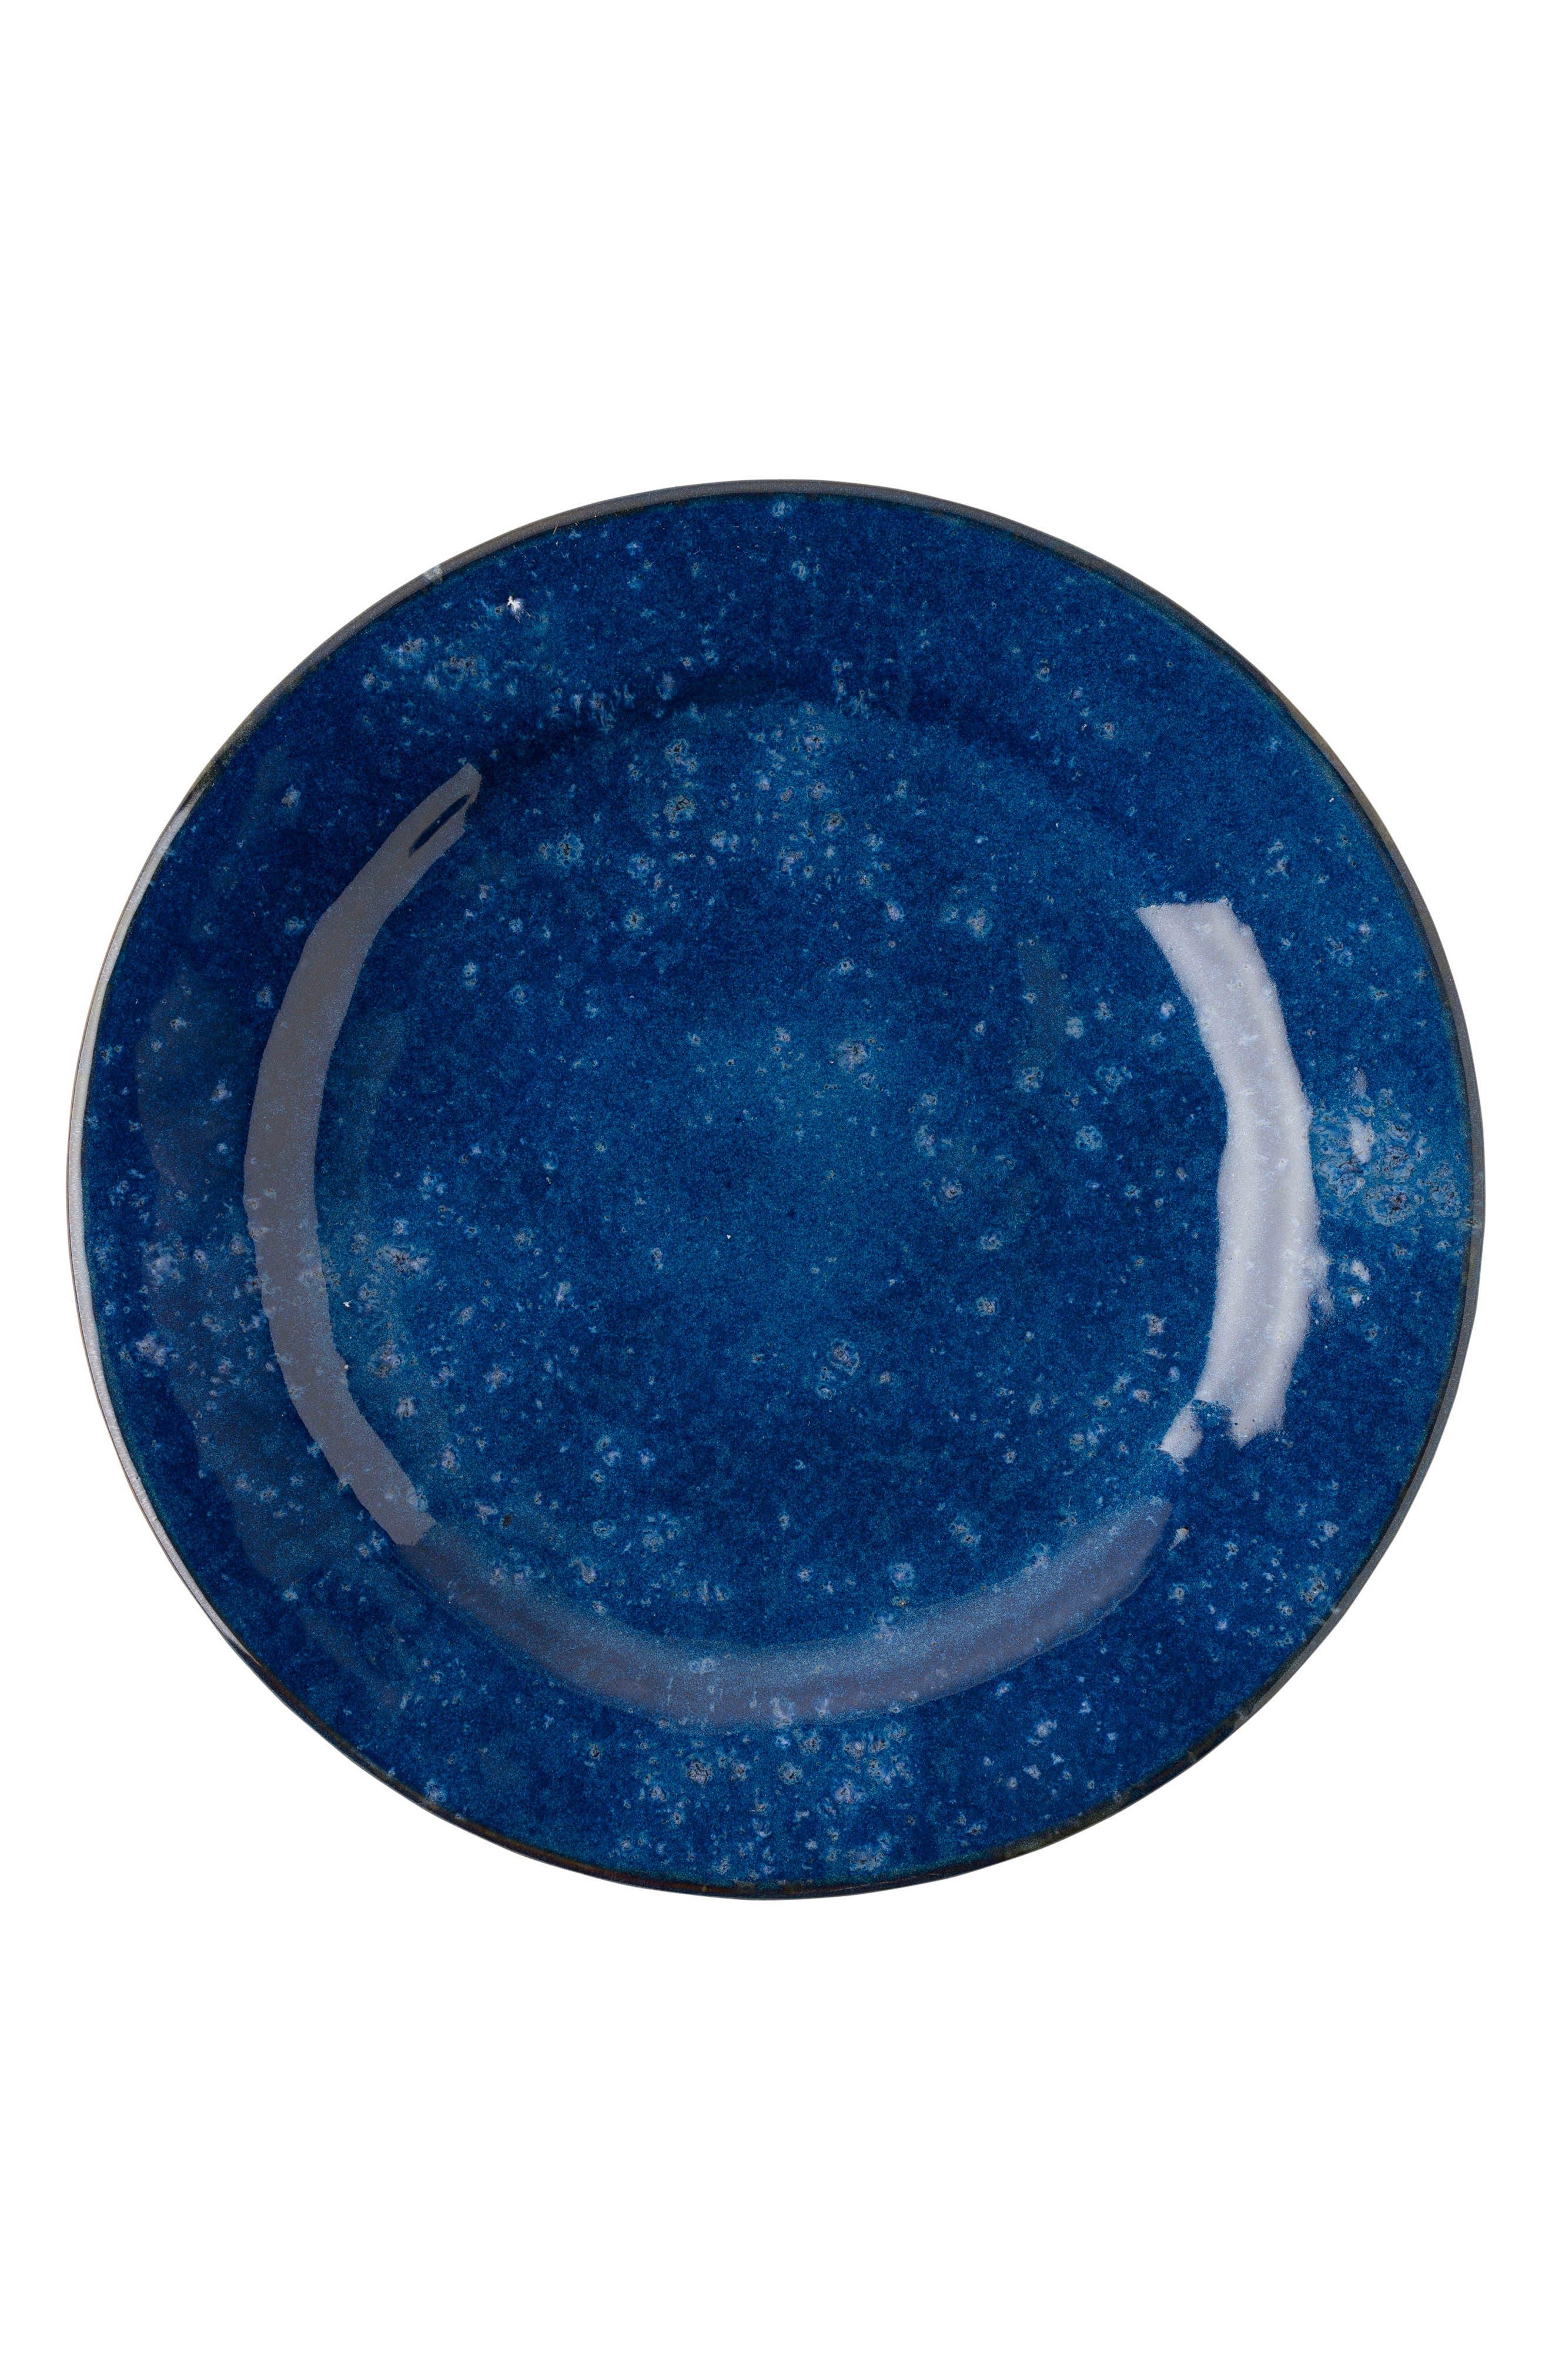 Puro Cobalt Ceramic Dinner Plate,                             Main thumbnail 1, color,                             DAPPLED COBALT